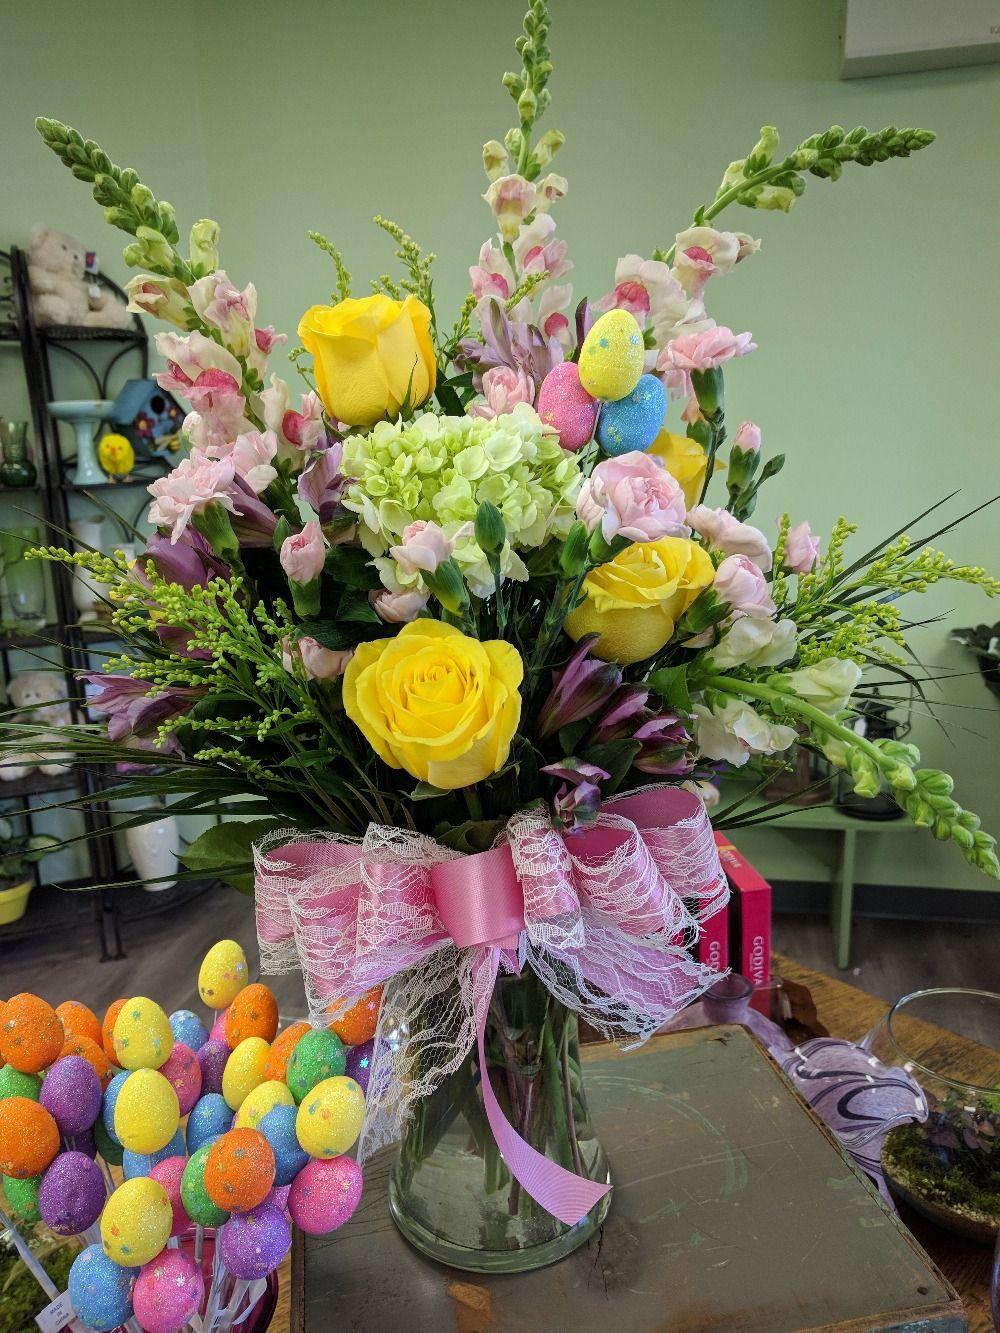 Easter Arrangement In Easton PA, Grace Garden Florist